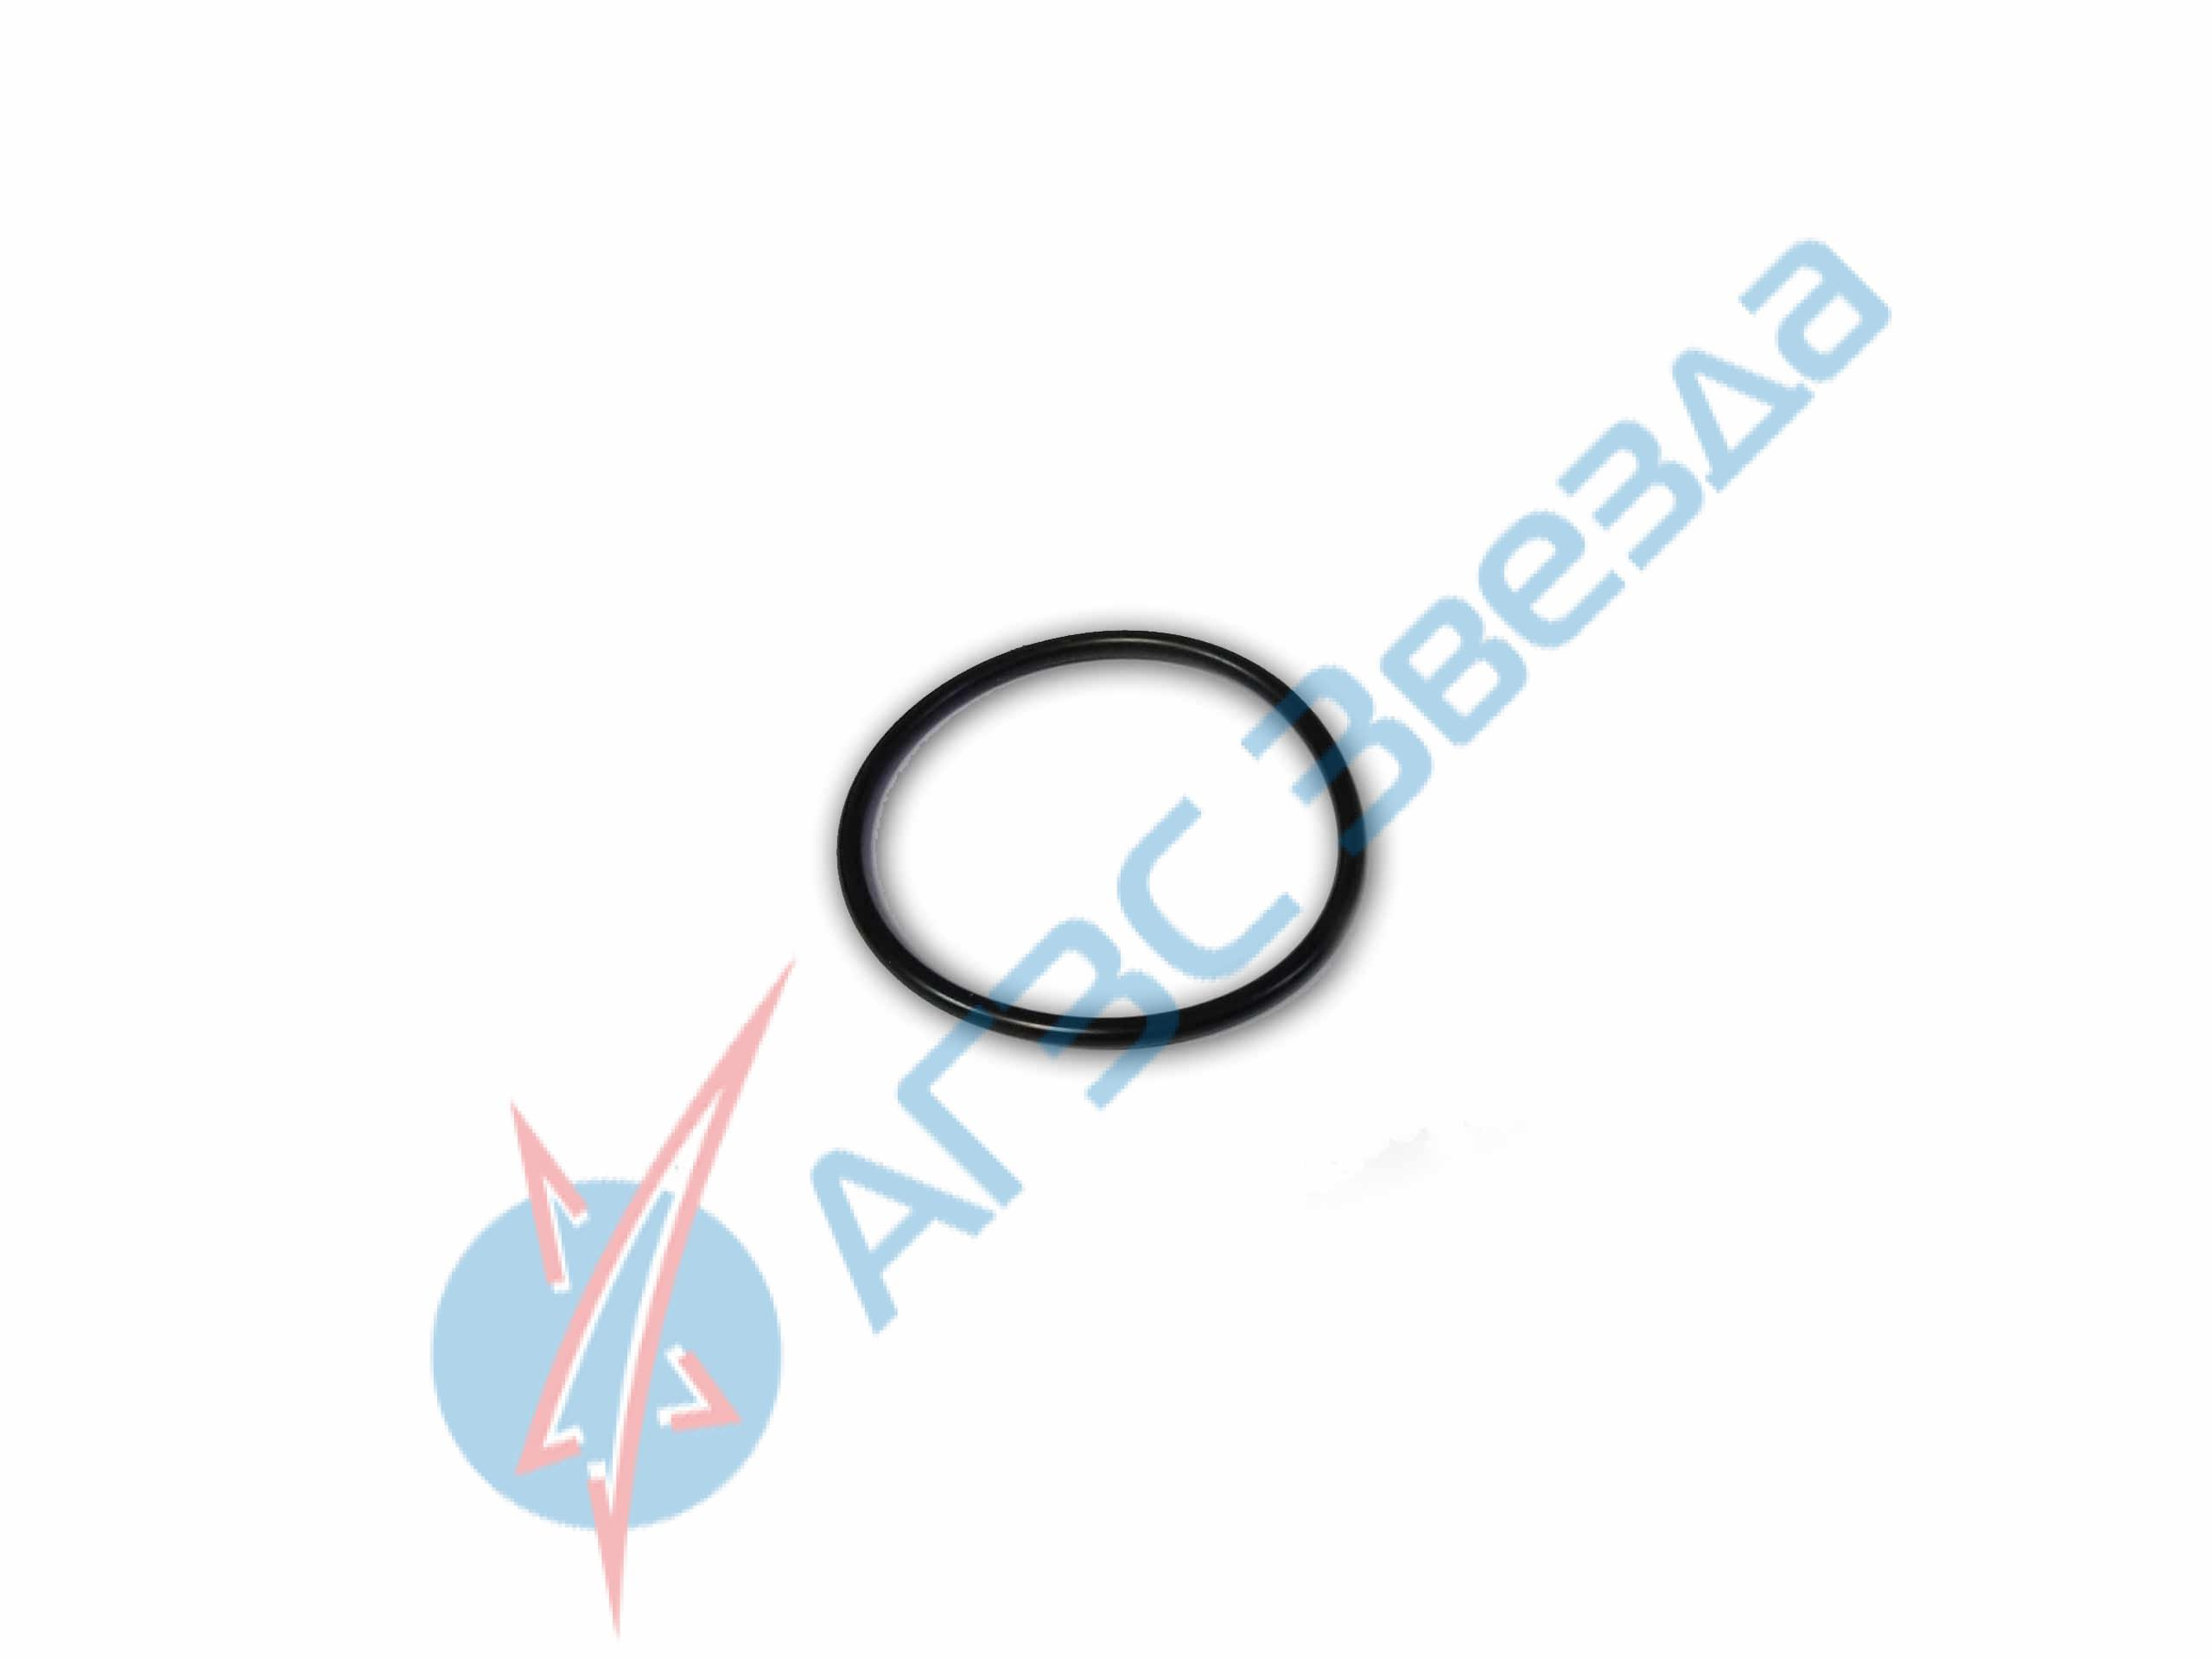 Кольцо Atiker на ЭМК газа нового образца